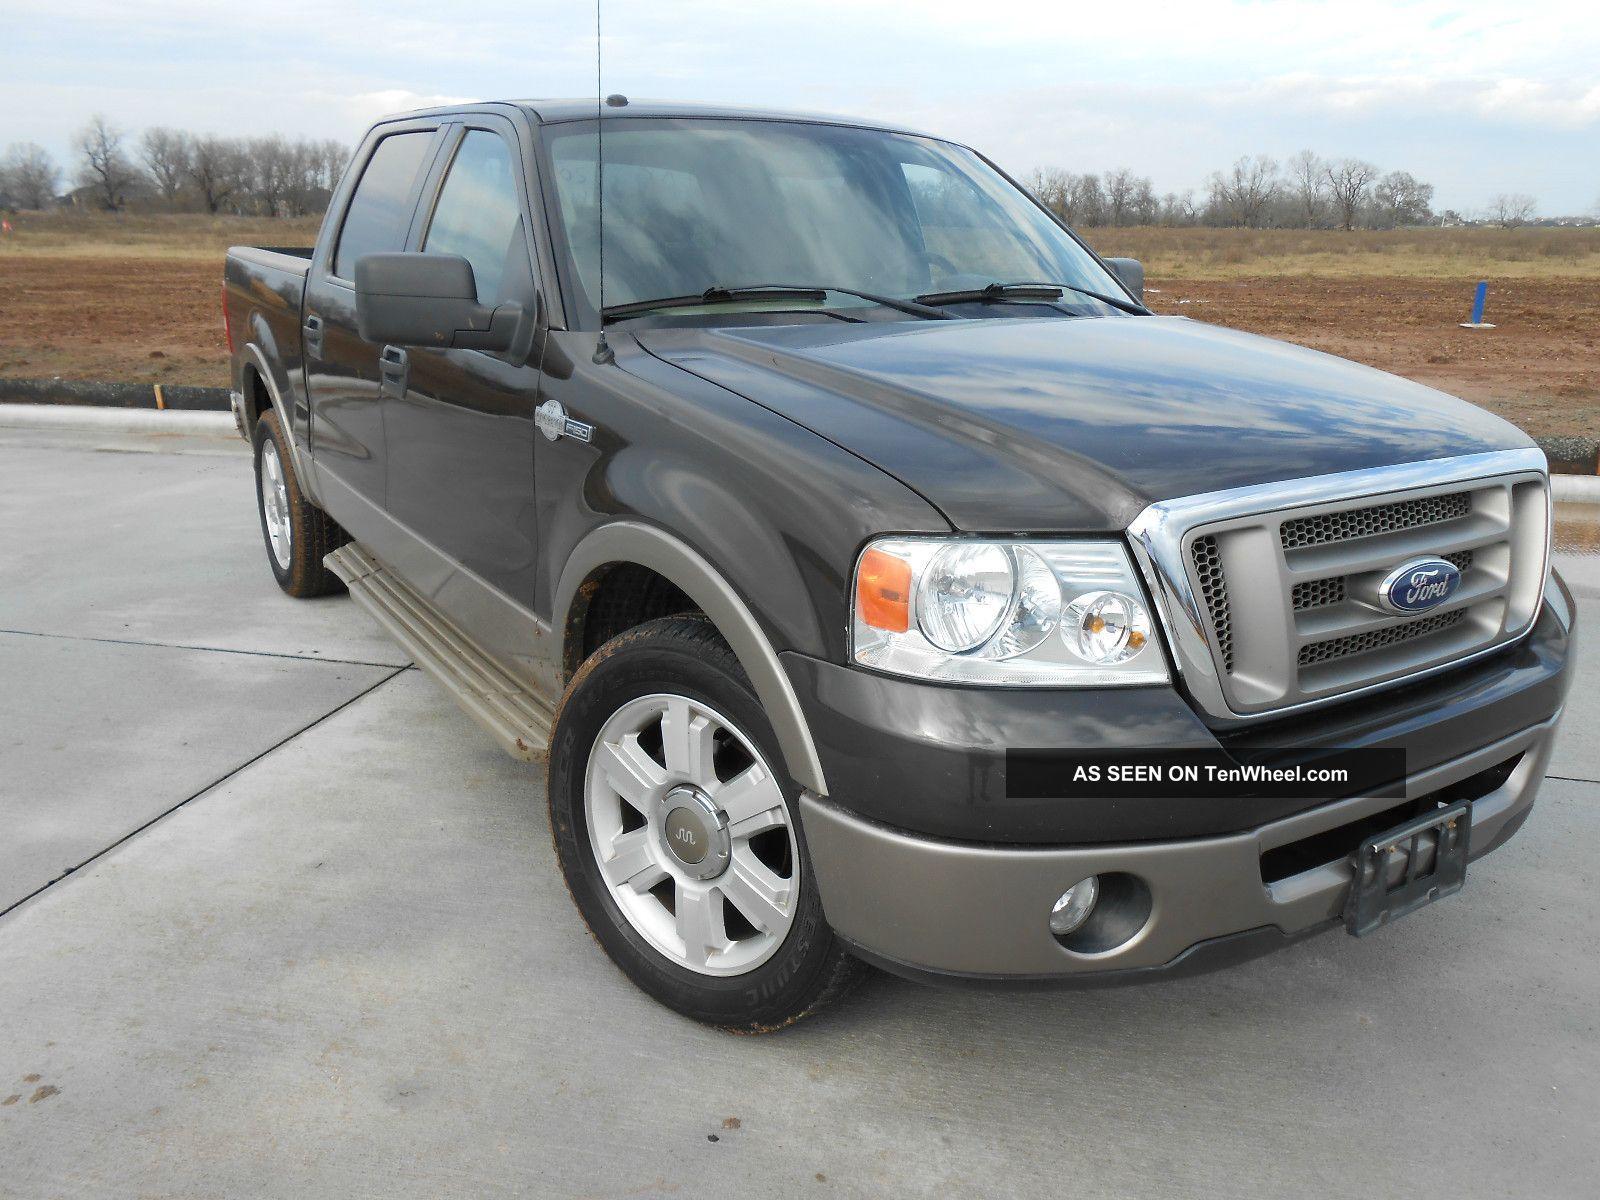 2006 ford f 150 king ranch crew cab pickup 4 door 5 4l. Black Bedroom Furniture Sets. Home Design Ideas